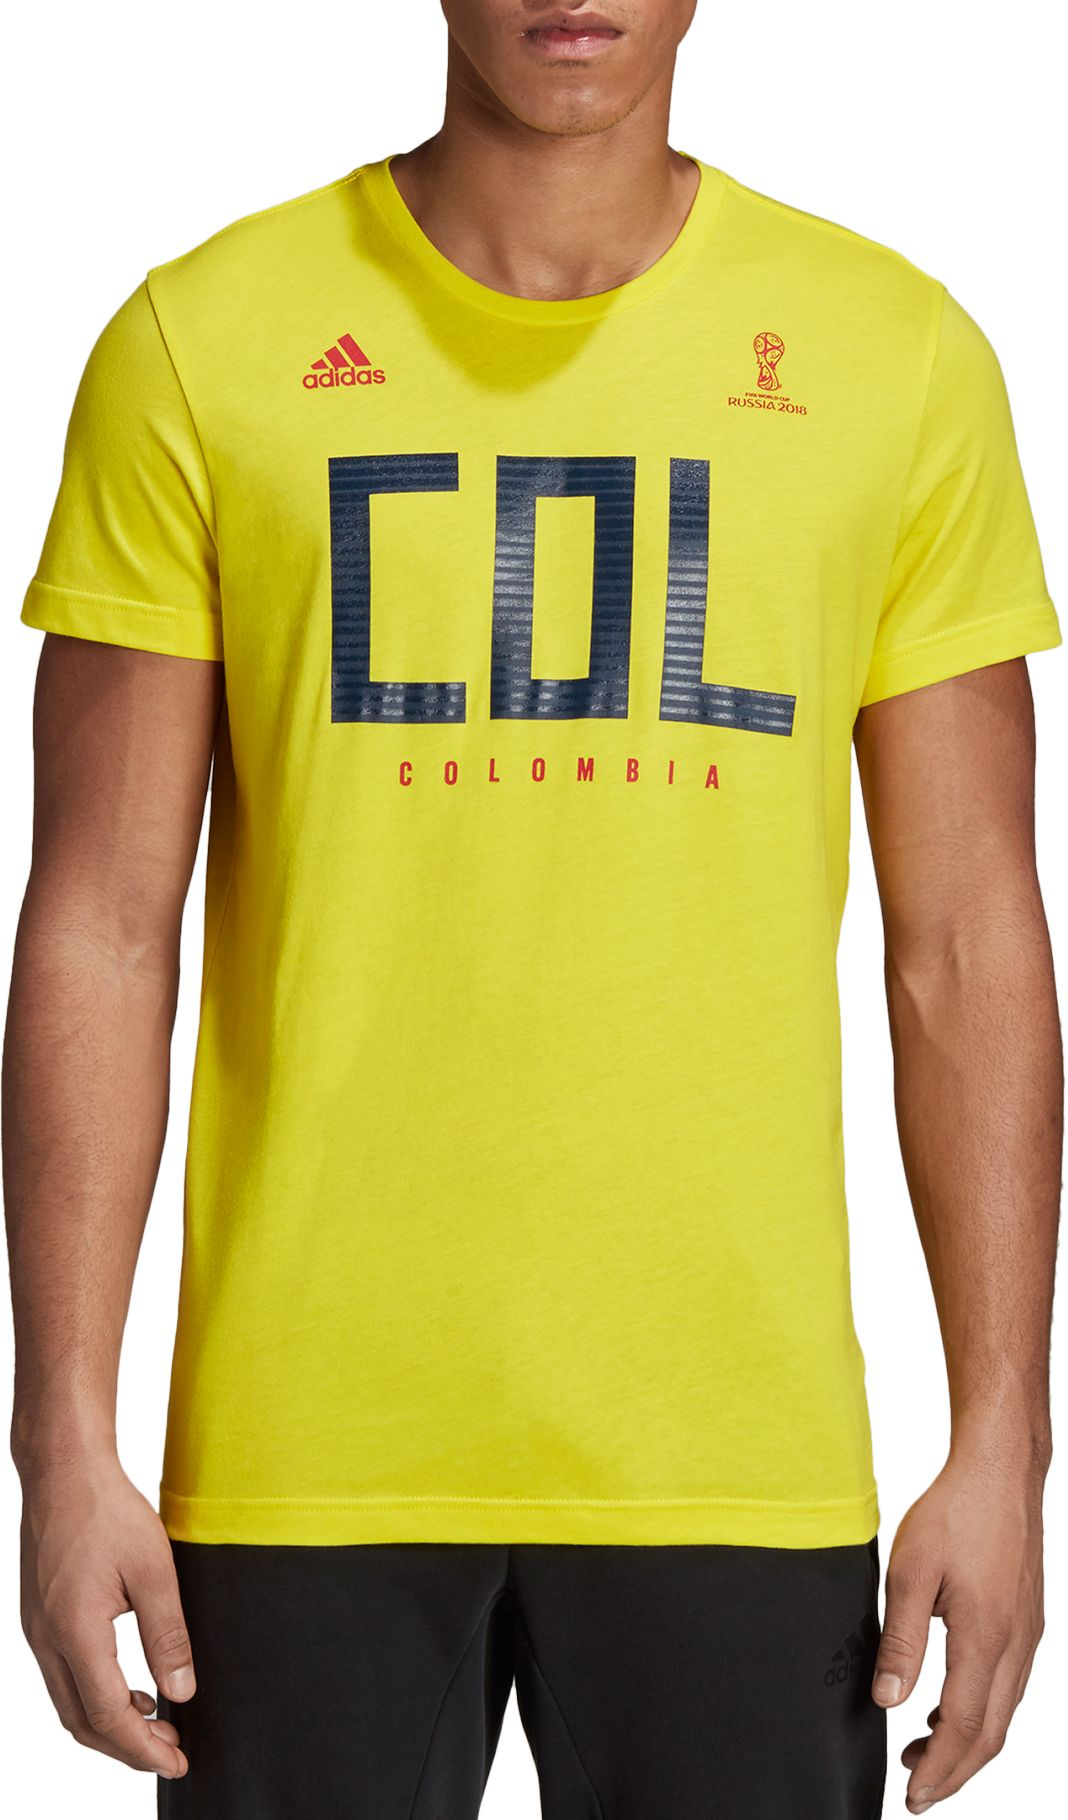 c2c256b51 Adidas Fifa World Cup T Shirt - Nils Stucki Kieferorthopäde